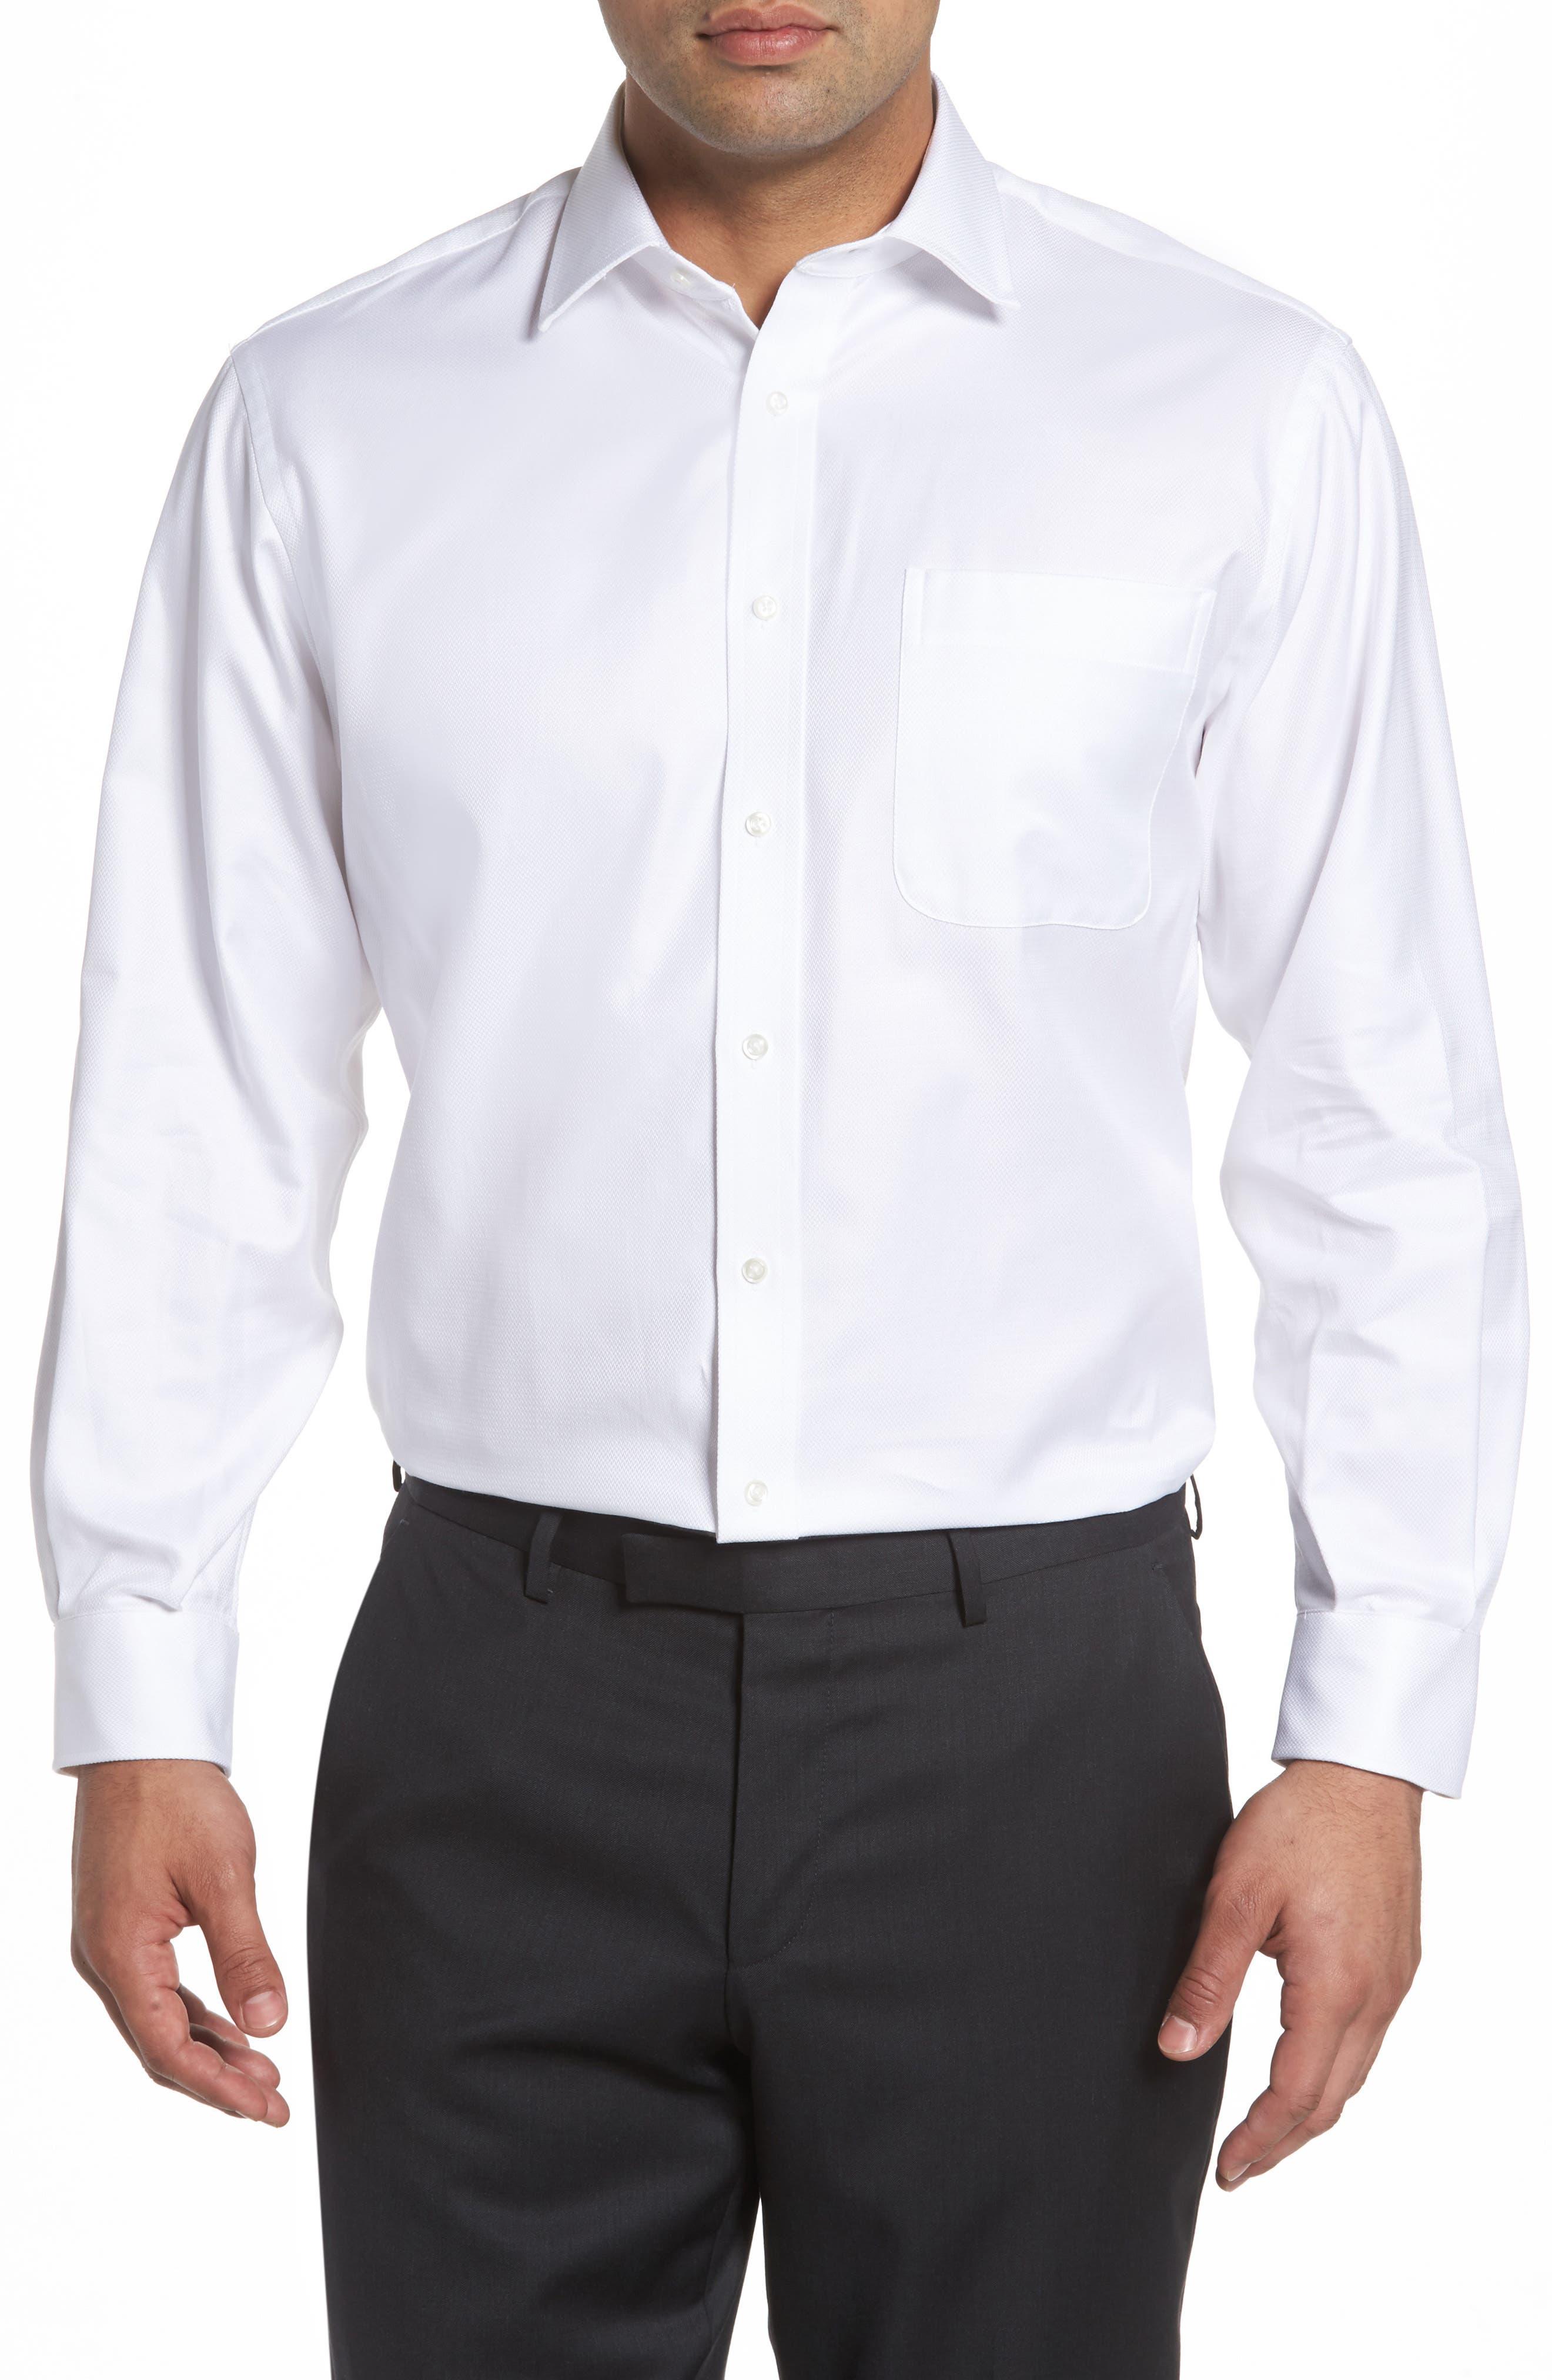 Nordstrom Menu0026#39;s Shop Classic Fit Textured Dress Shirt | Nordstrom